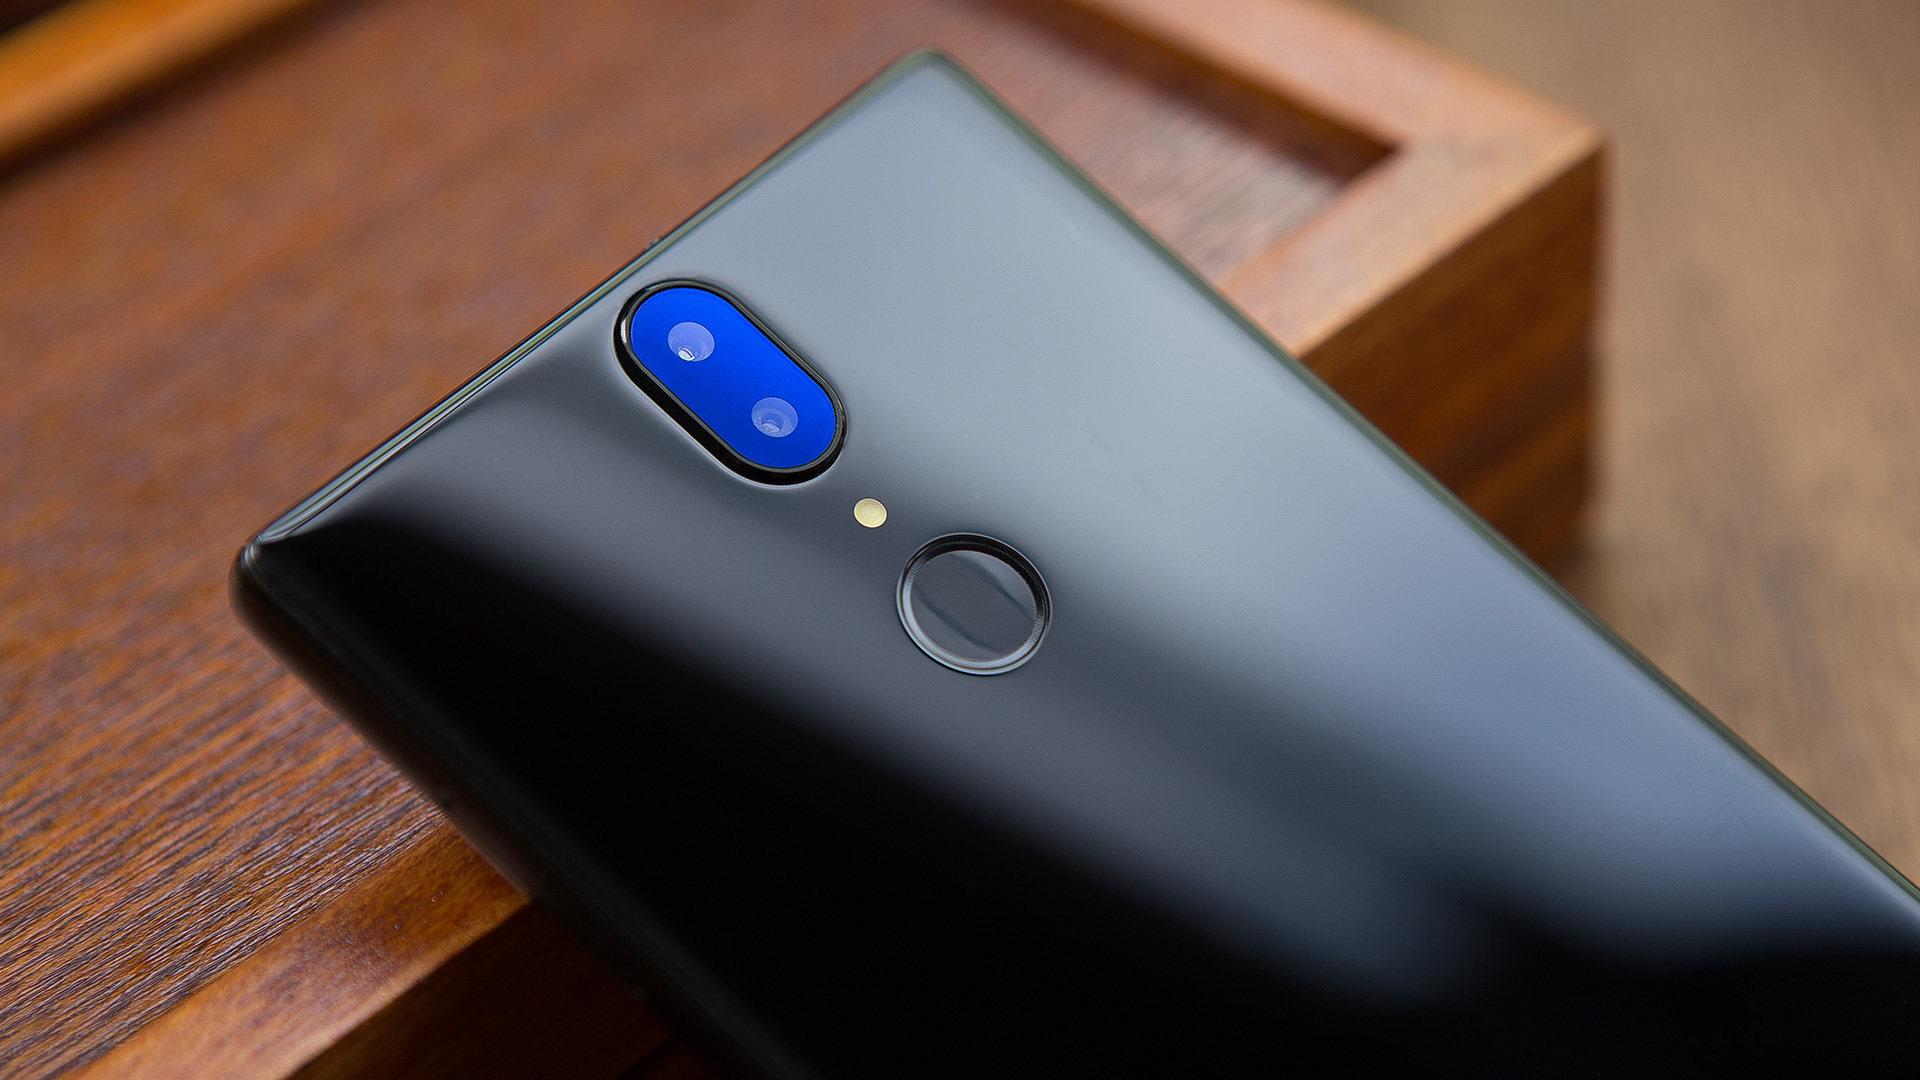 UMIDIGI анонсировала смартфон S2 Pro